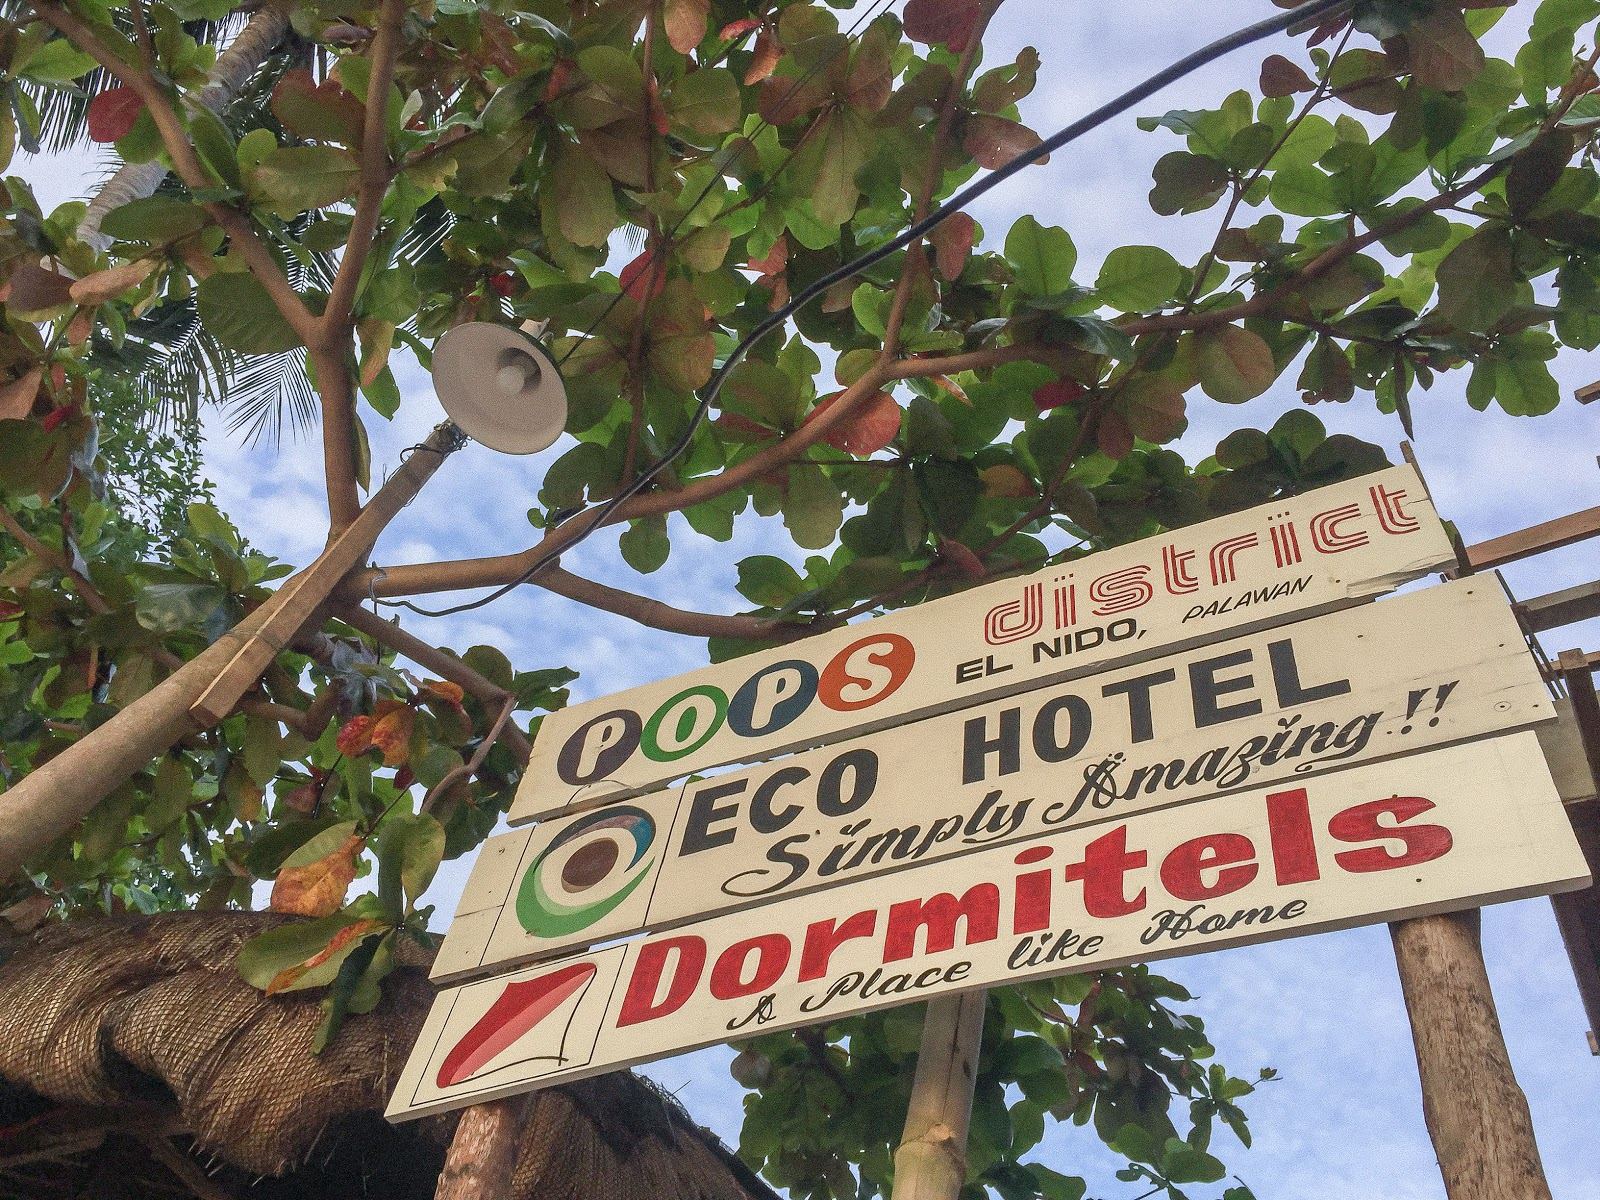 photo of Dormitel and Ecohotels